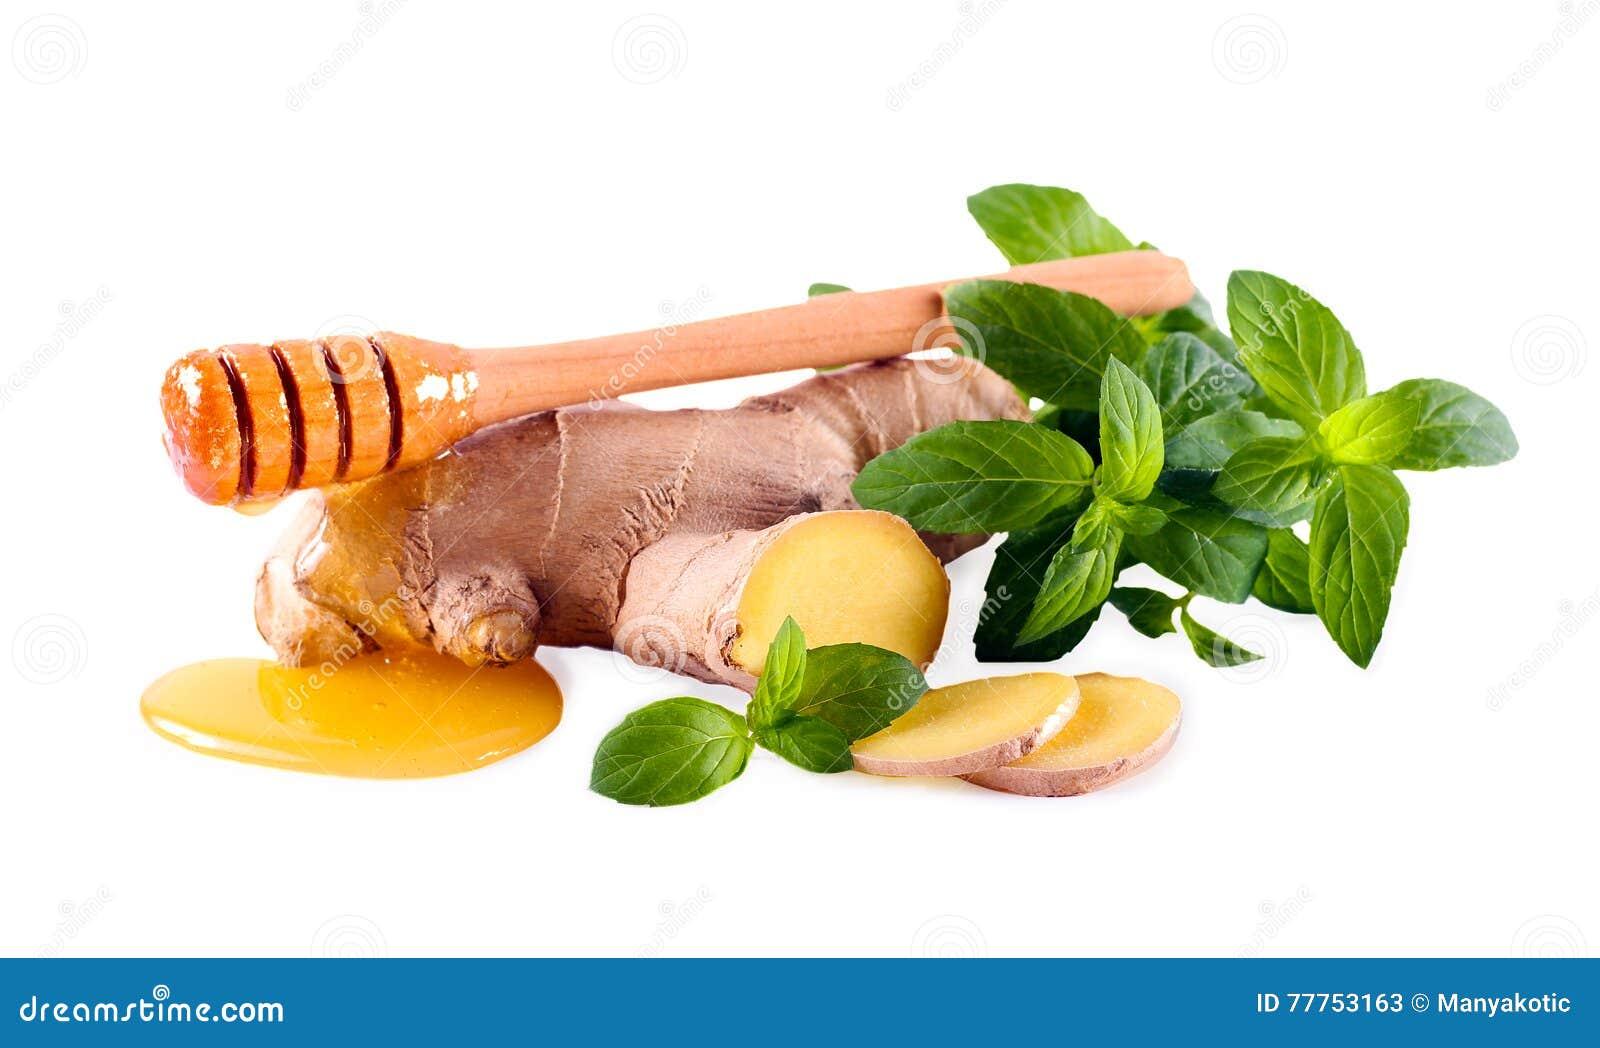 Gengibre, hortelã e mel sobre o fundo branco